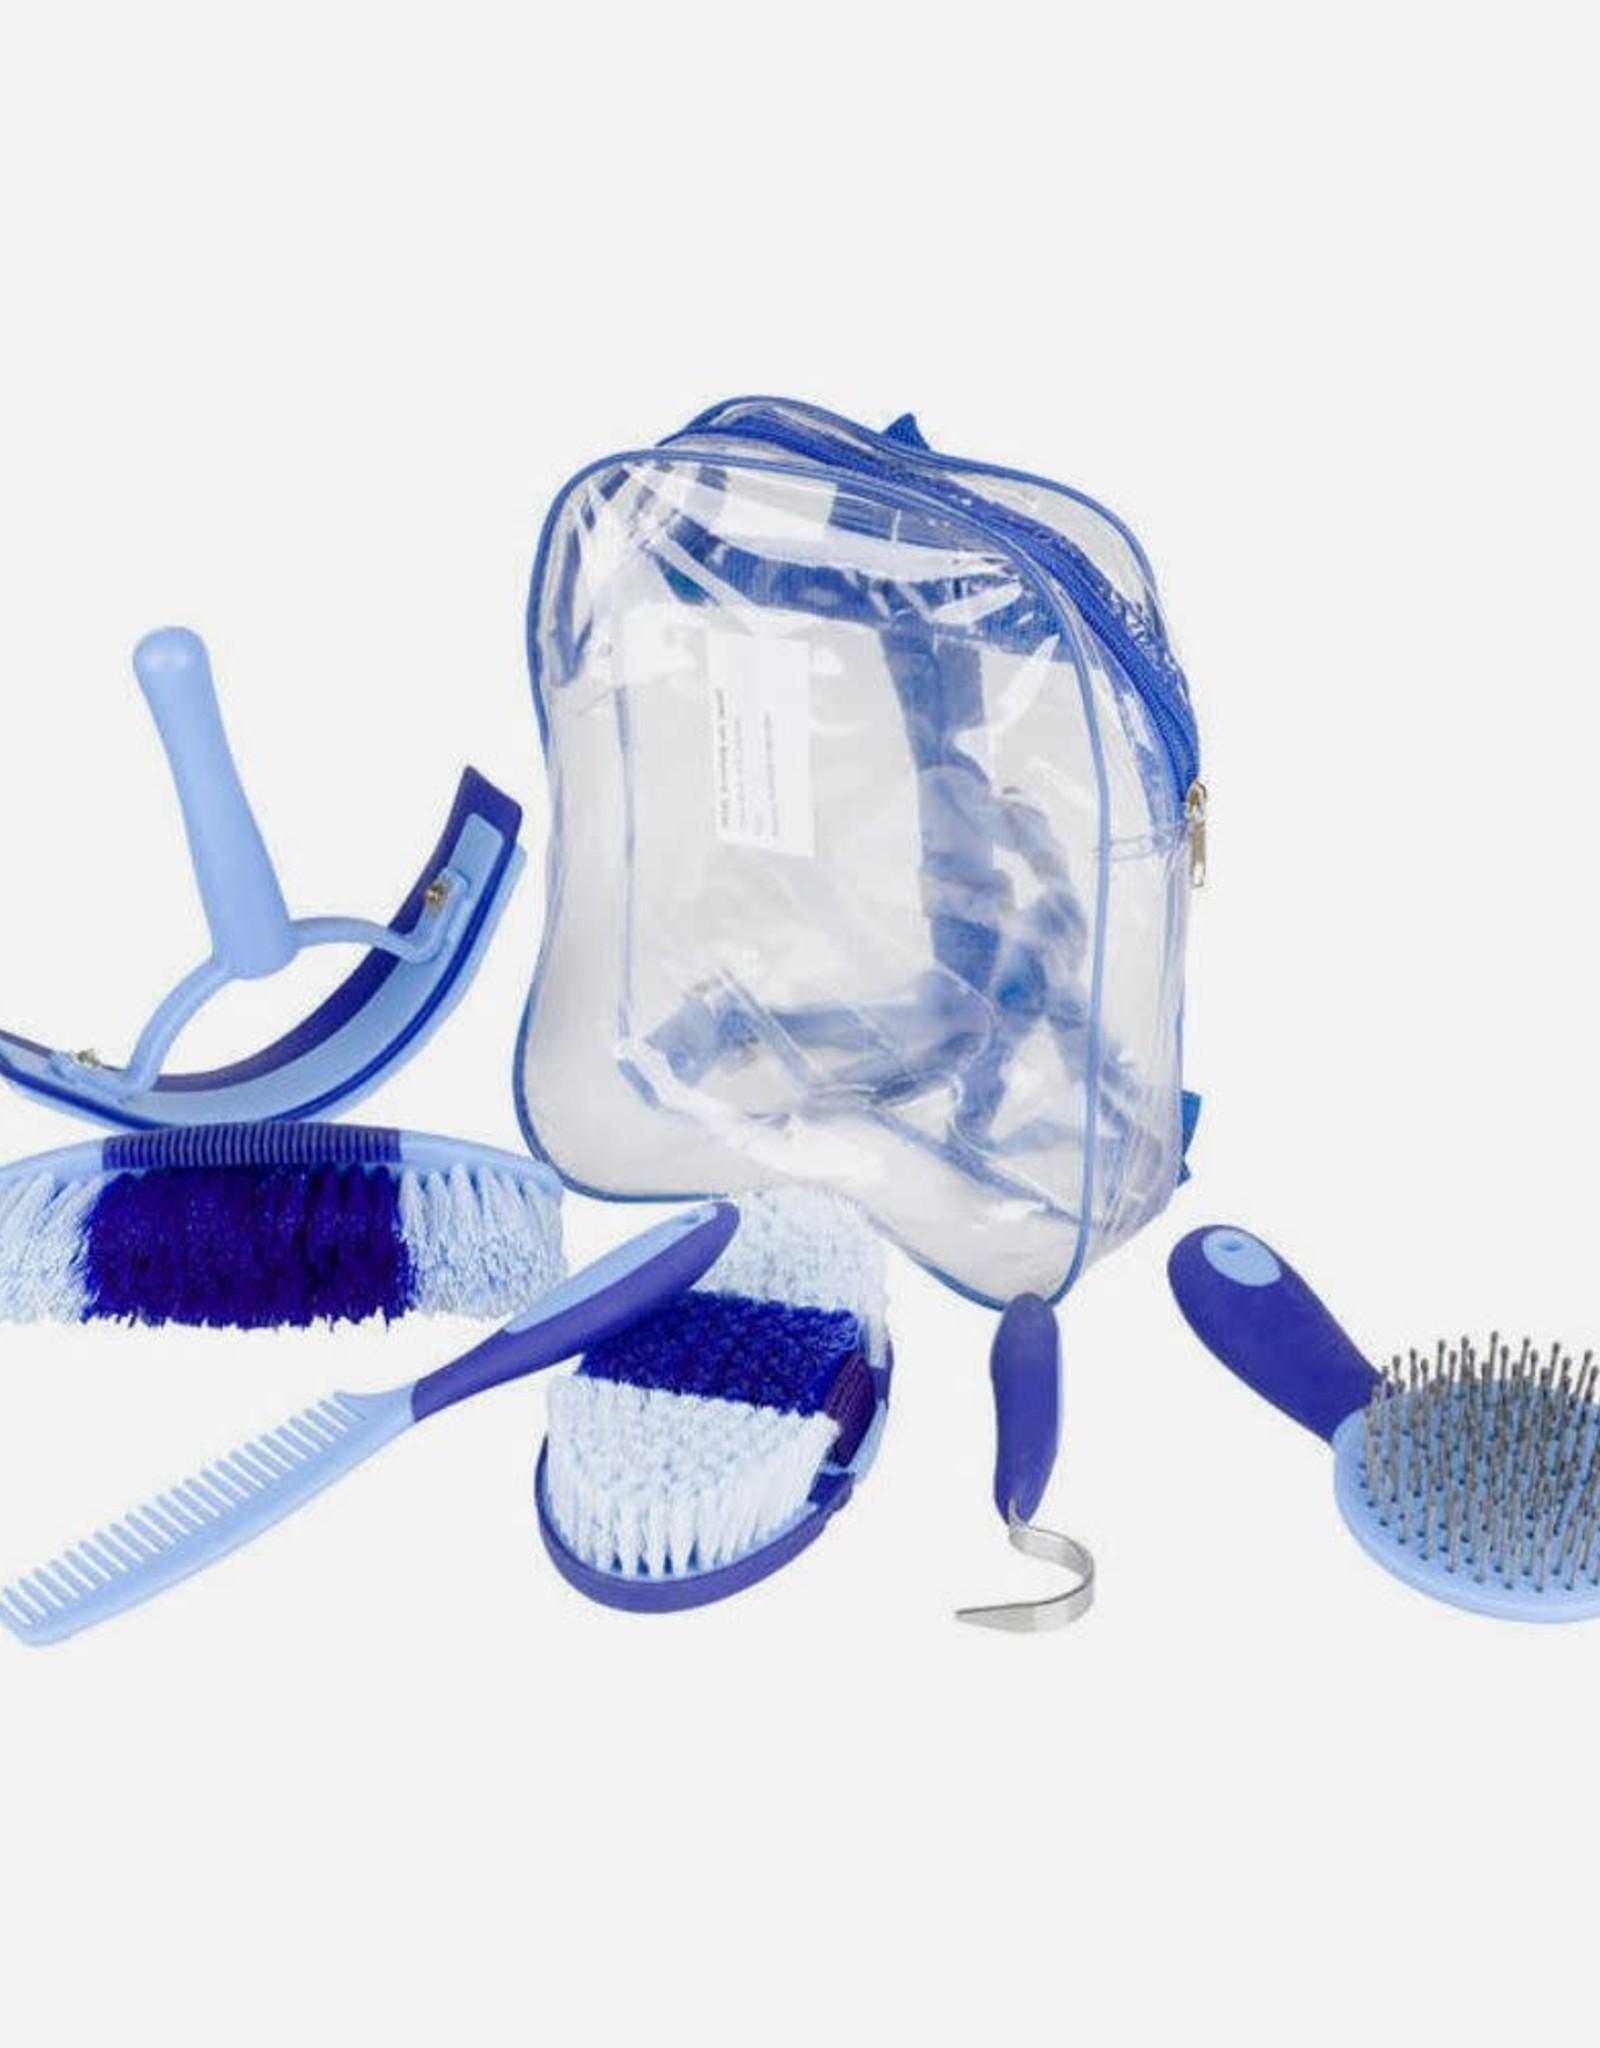 HORZE Sweet Grooming Set in Carry Bag